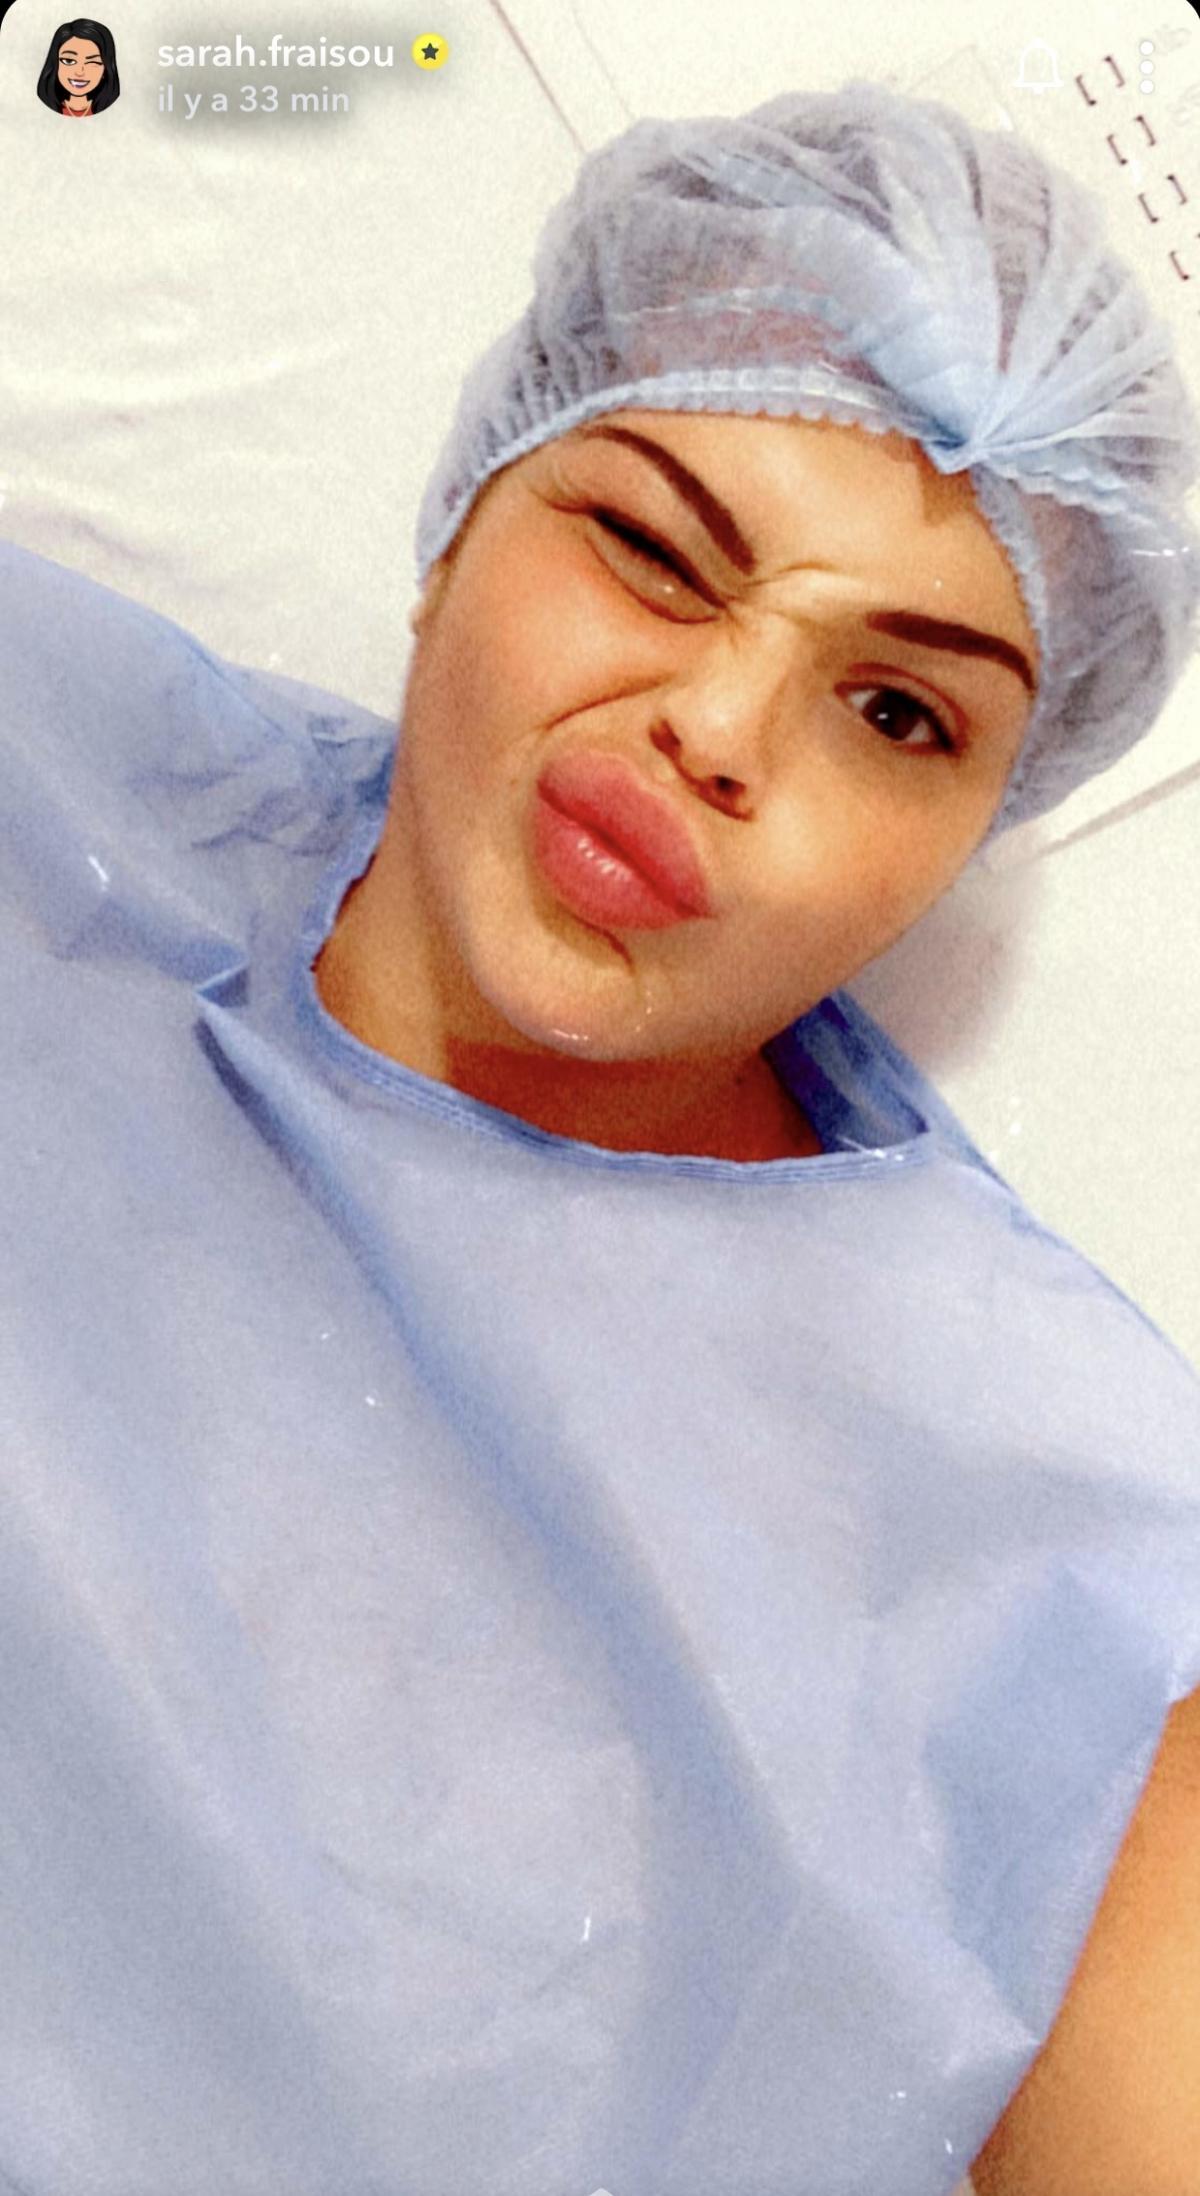 operation sarah fraisou